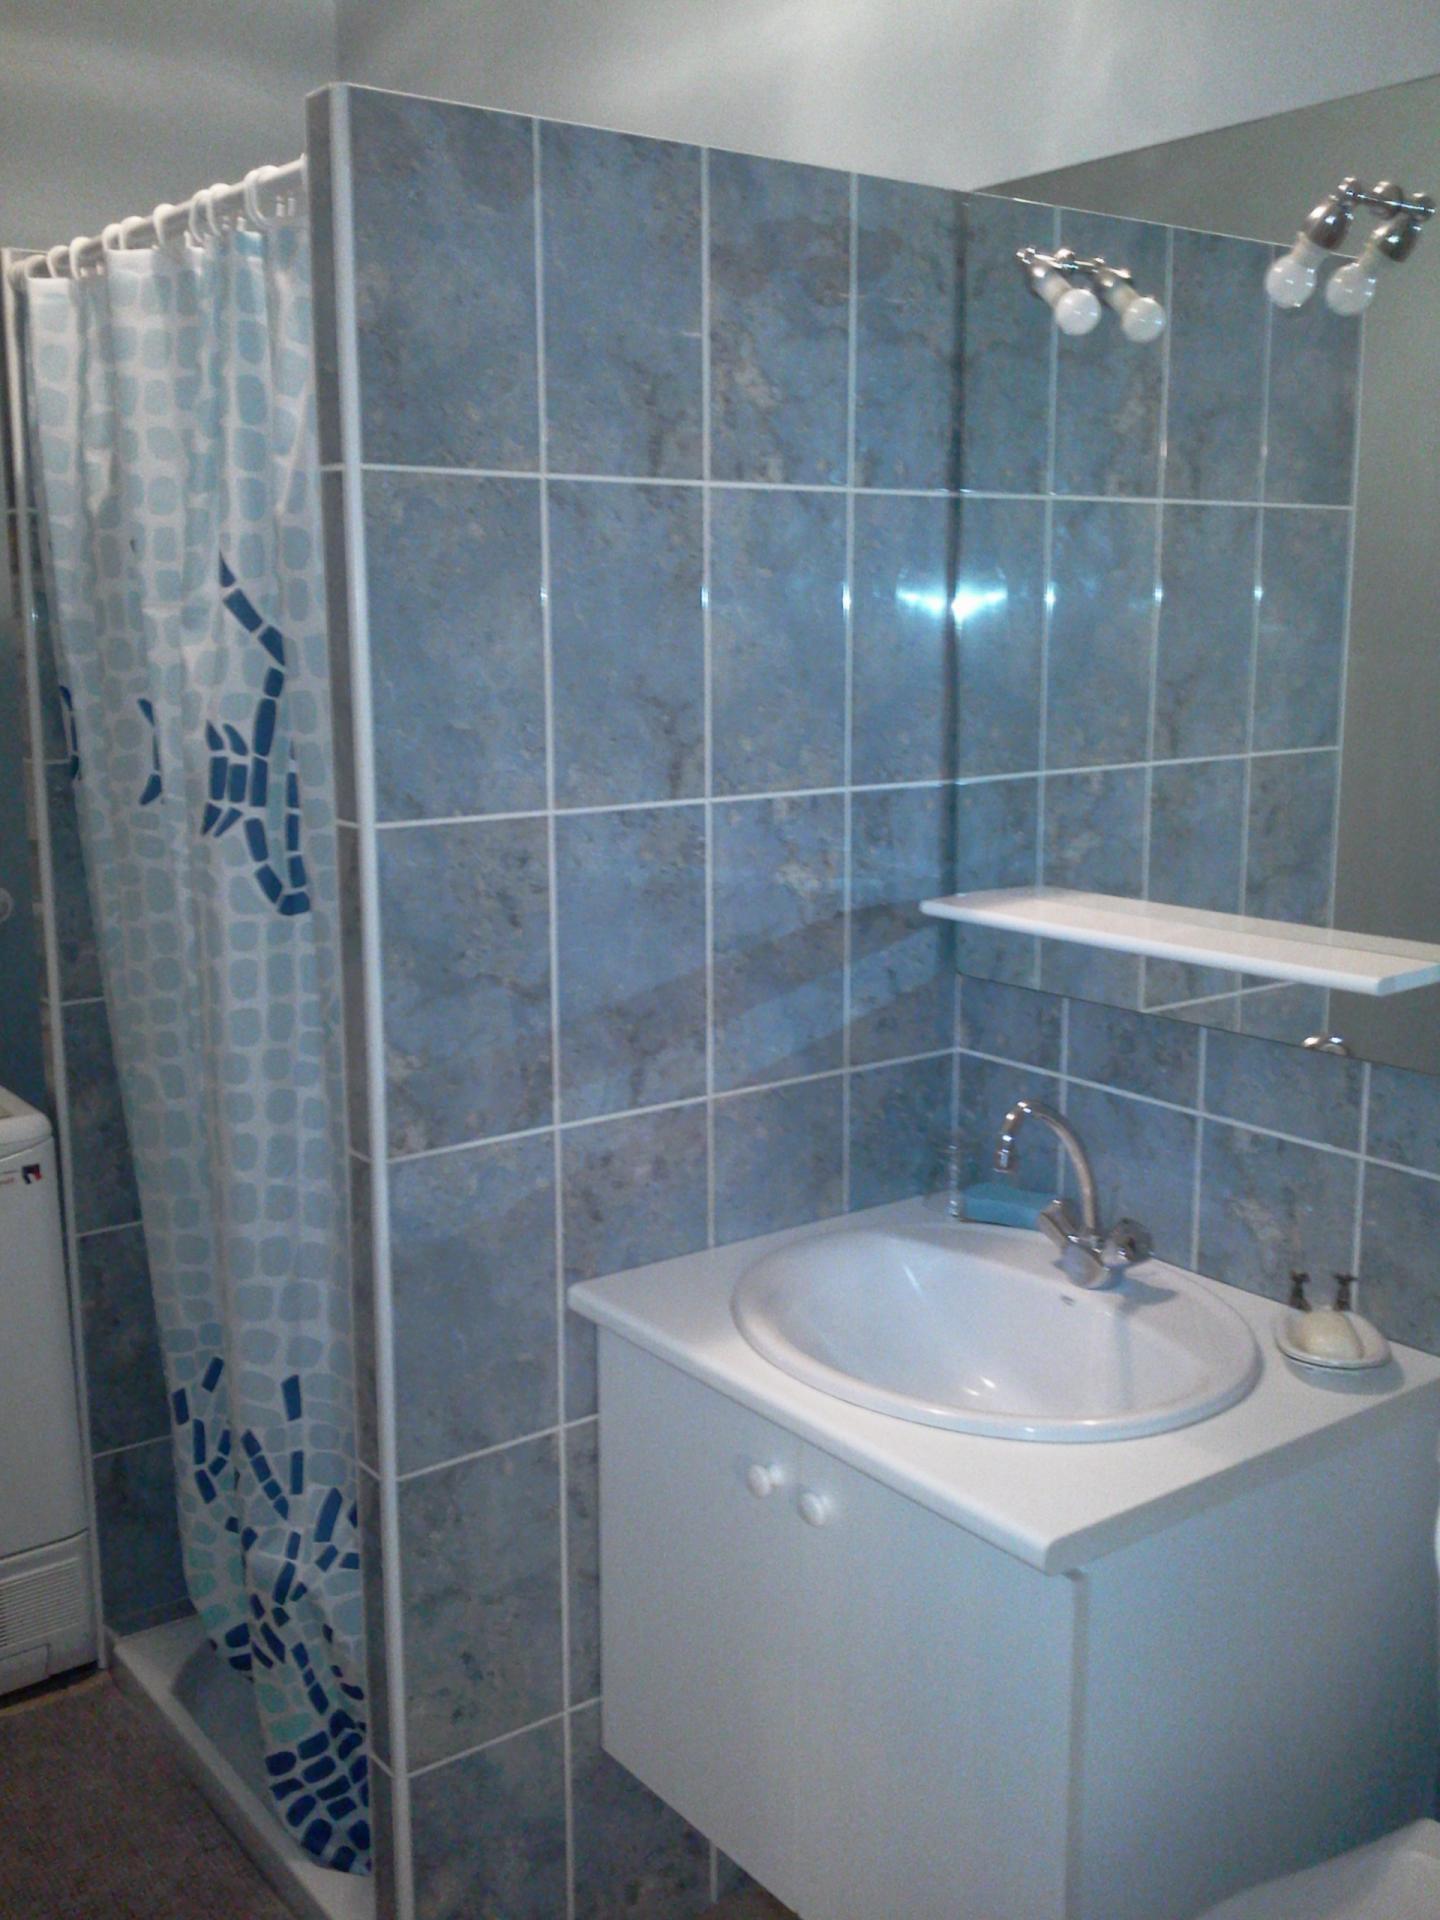 La salle de bain for Presentation salle de bain